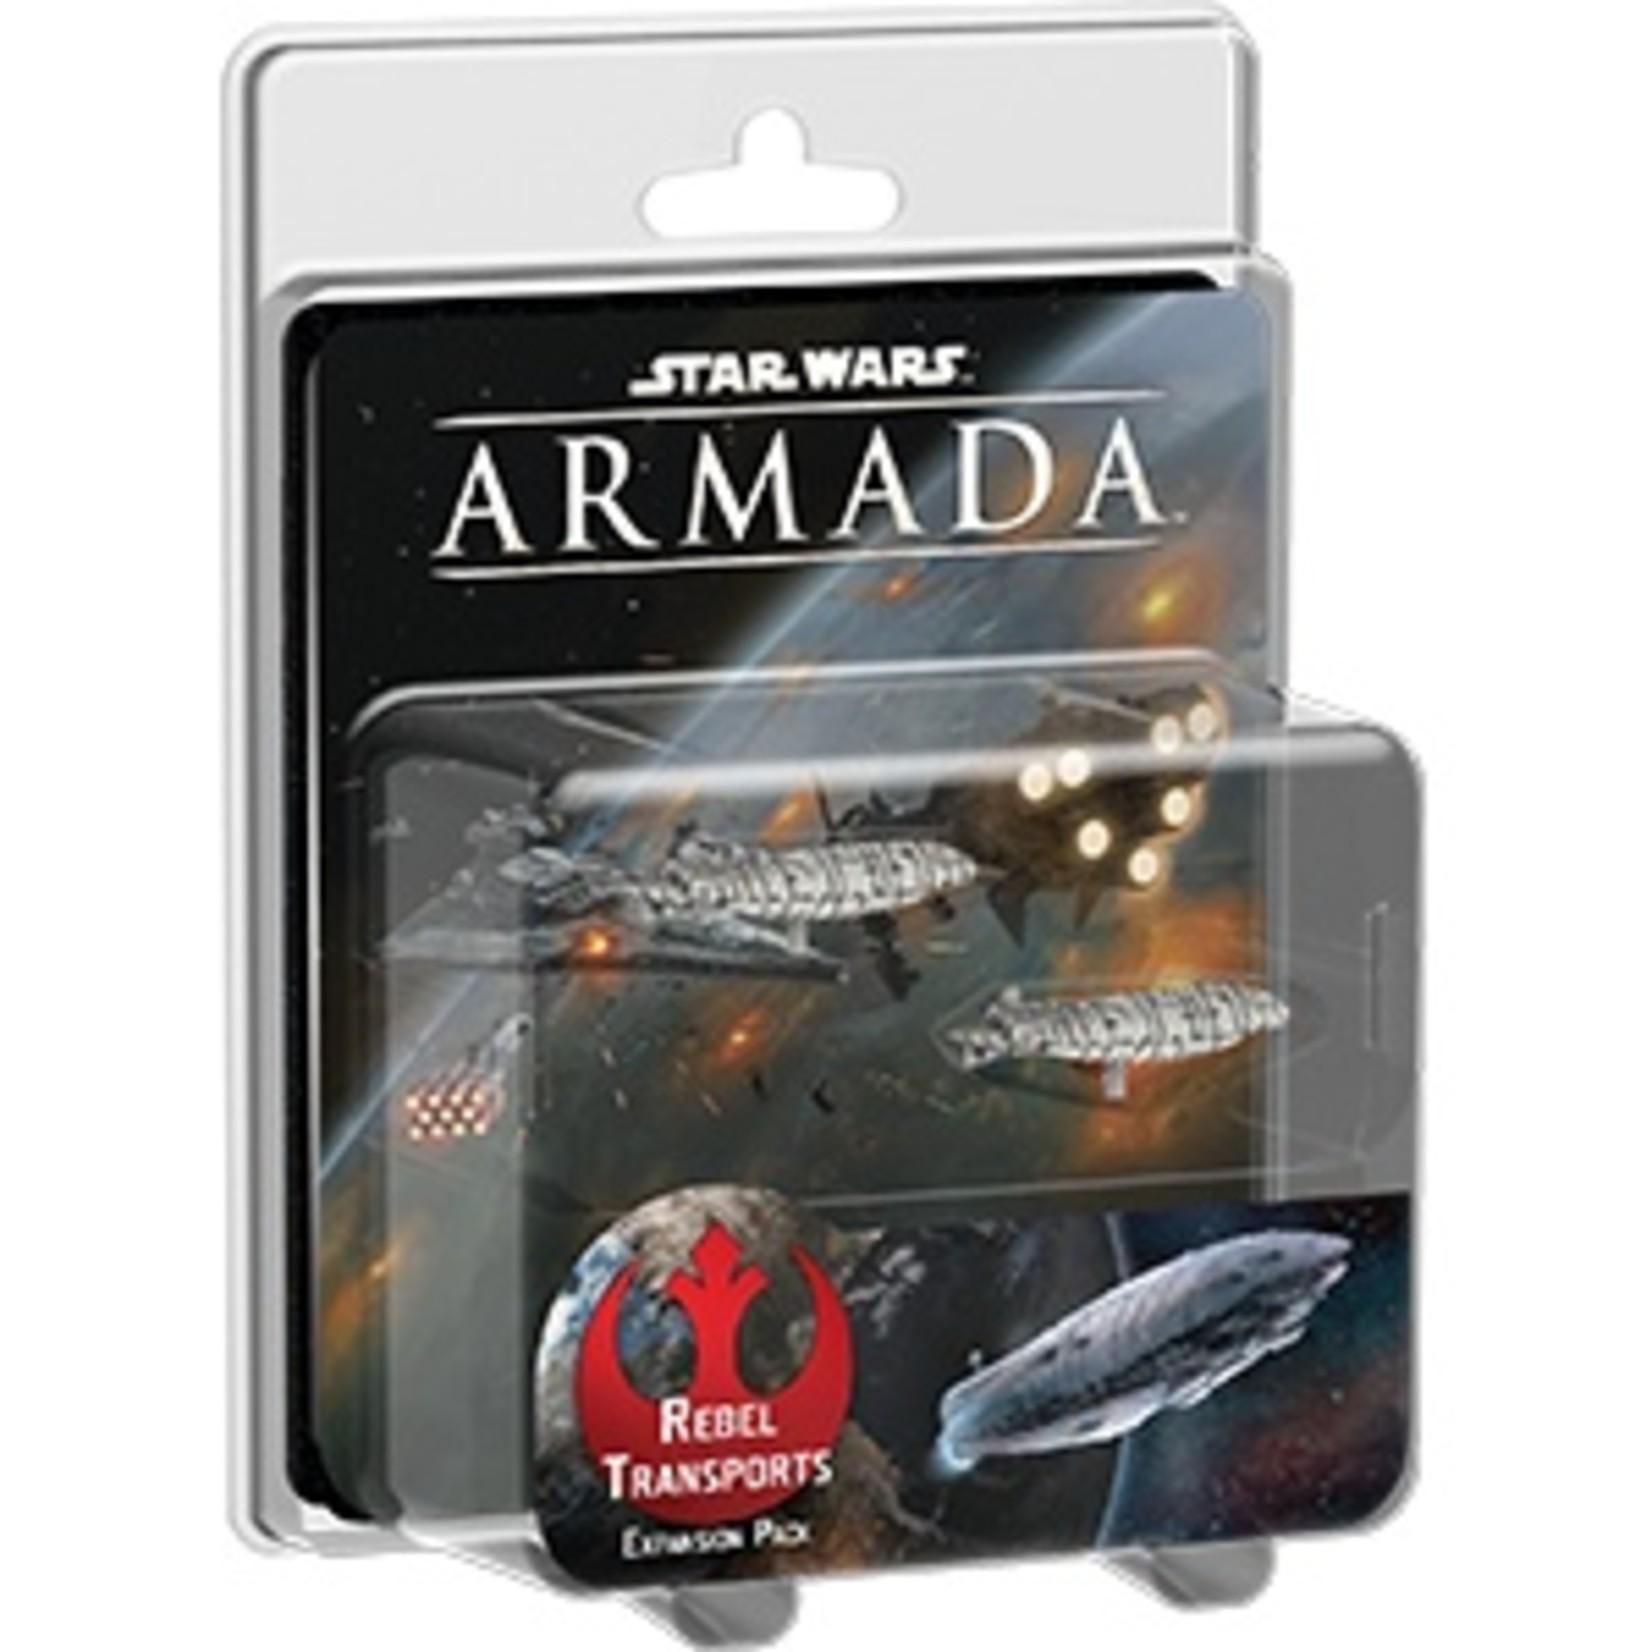 Fantasy Flight Games Star Wars Armada: Rebel Transports Expansion Pack